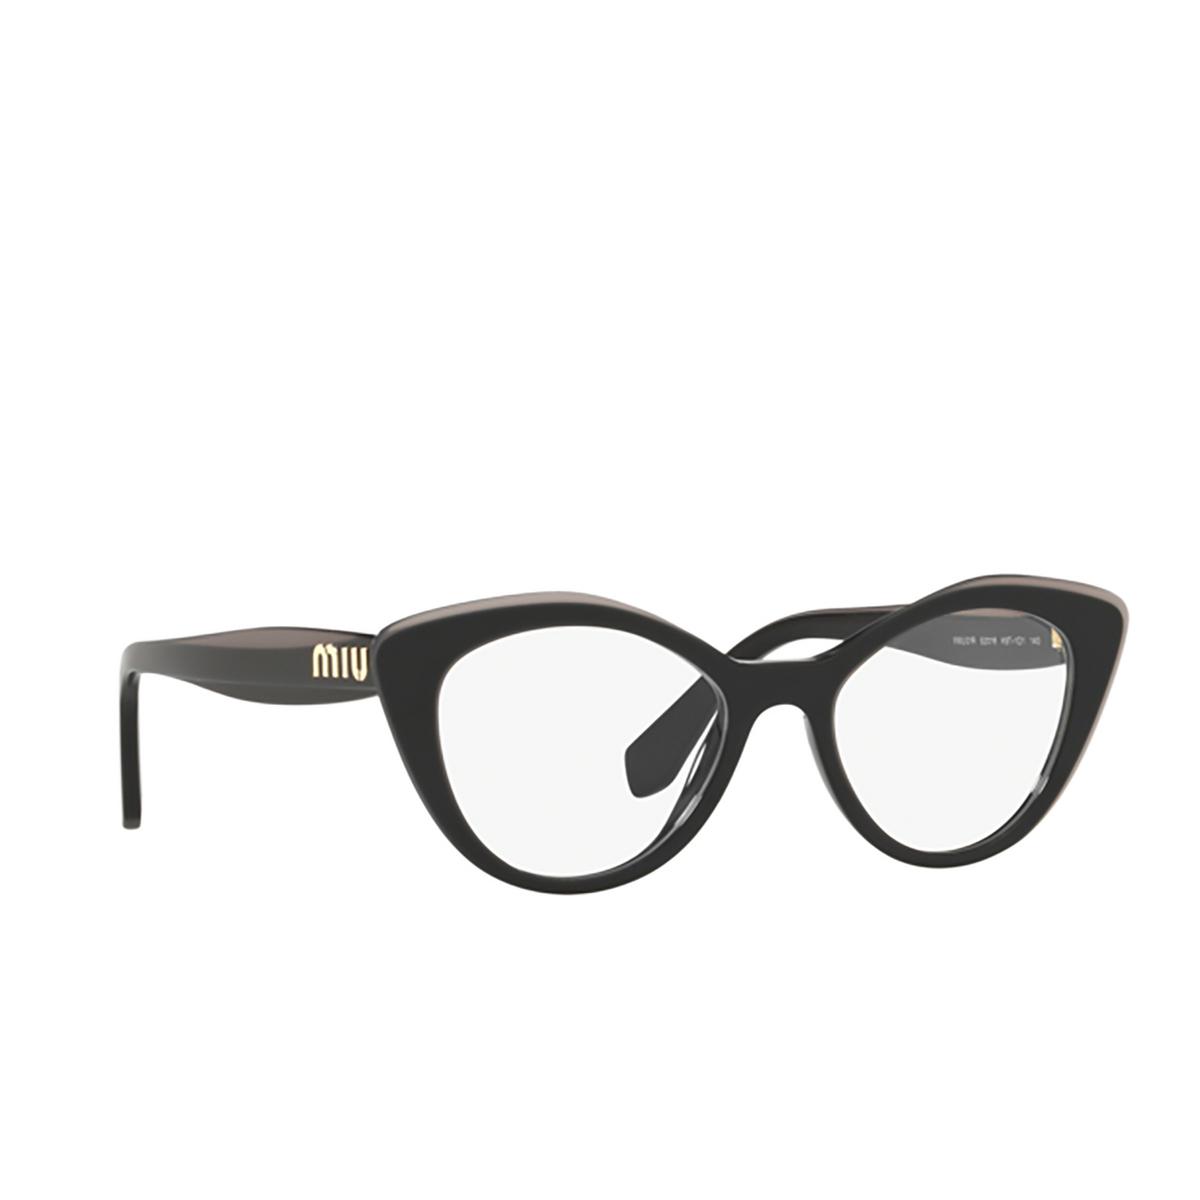 Miu Miu® Cat-eye Eyeglasses: MU 01RV color Black Top Grey K9T1O1 - three-quarters view.